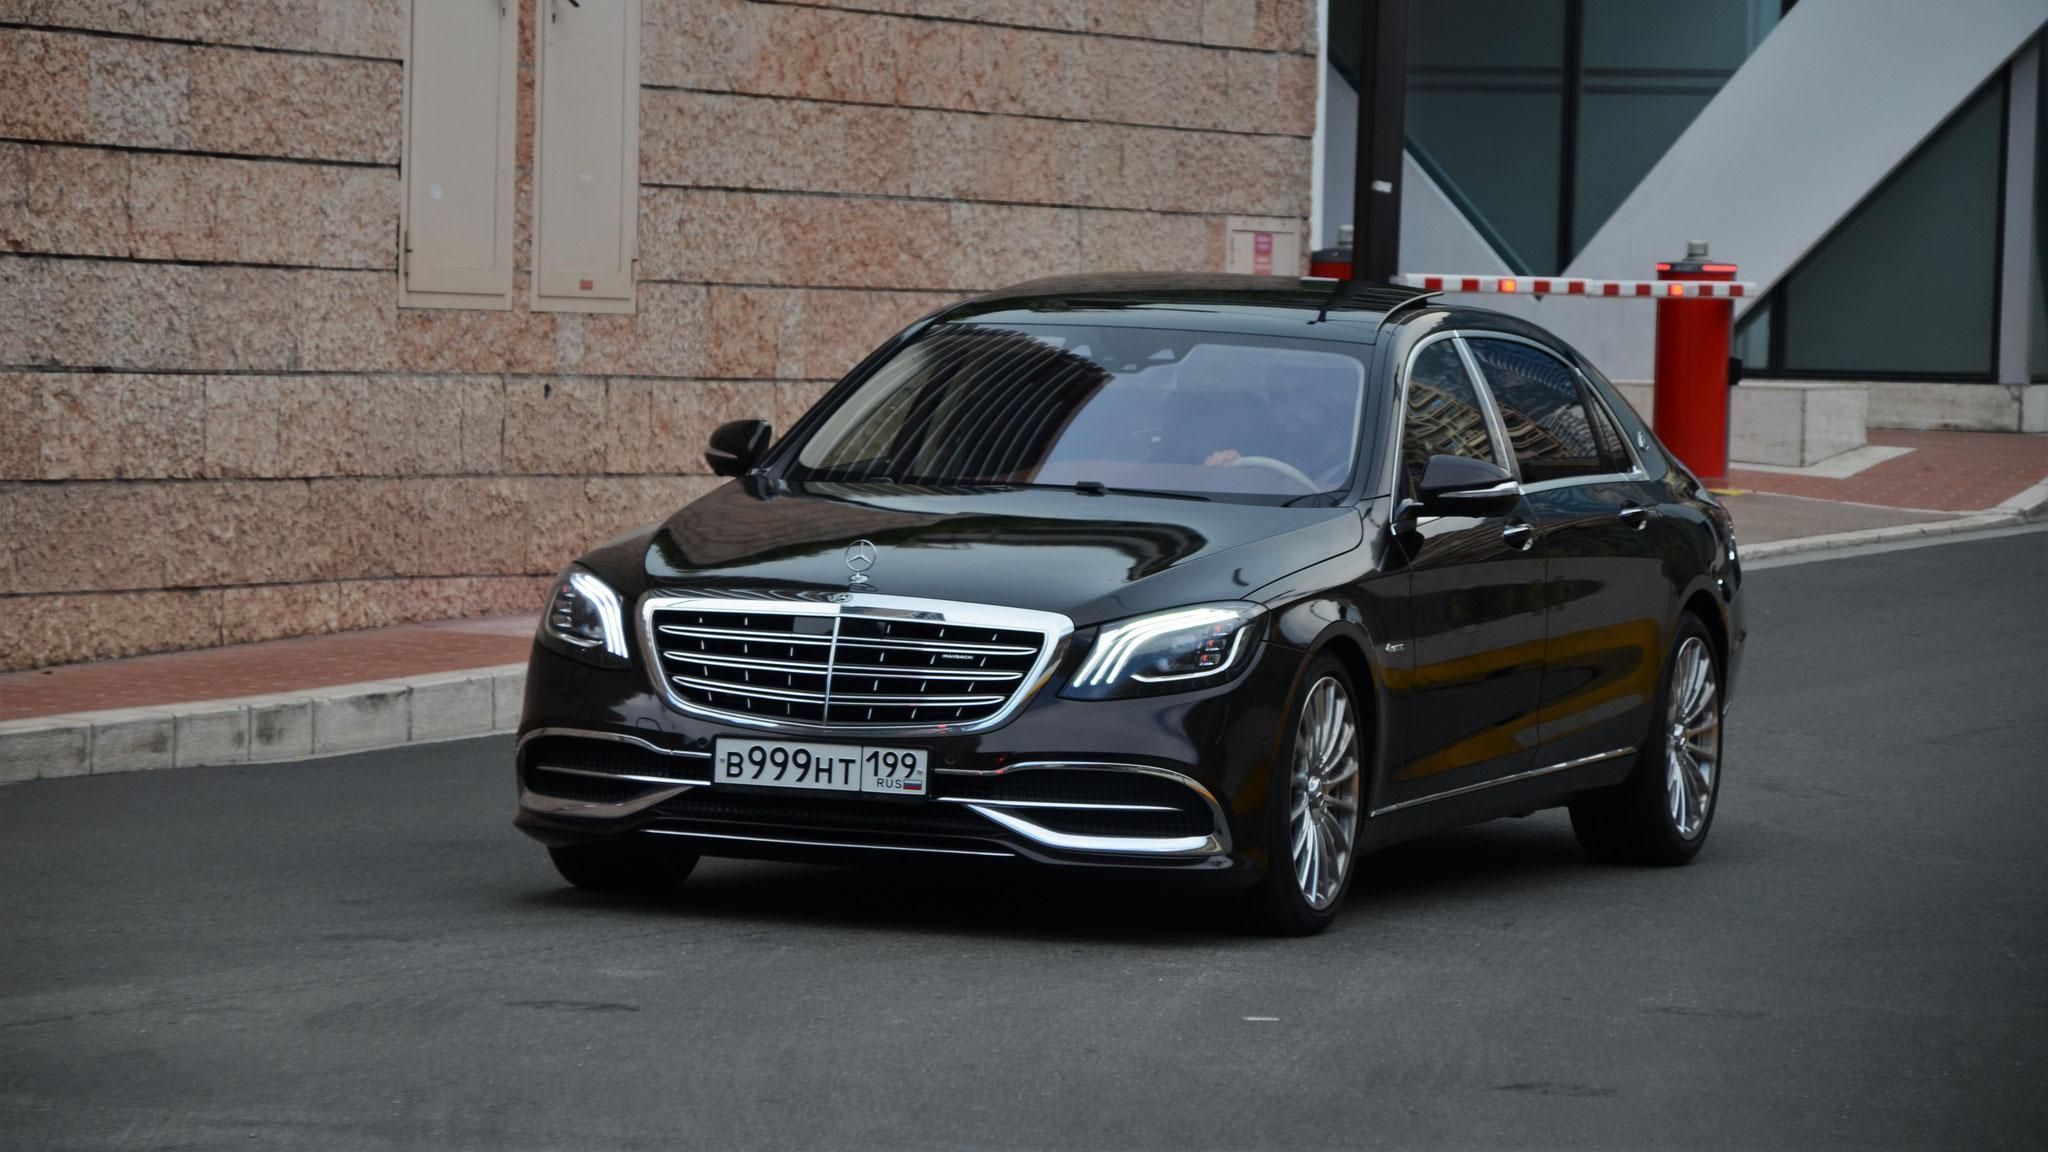 Mercedes Maybach S500 - B-999-HT-199 (RUS)